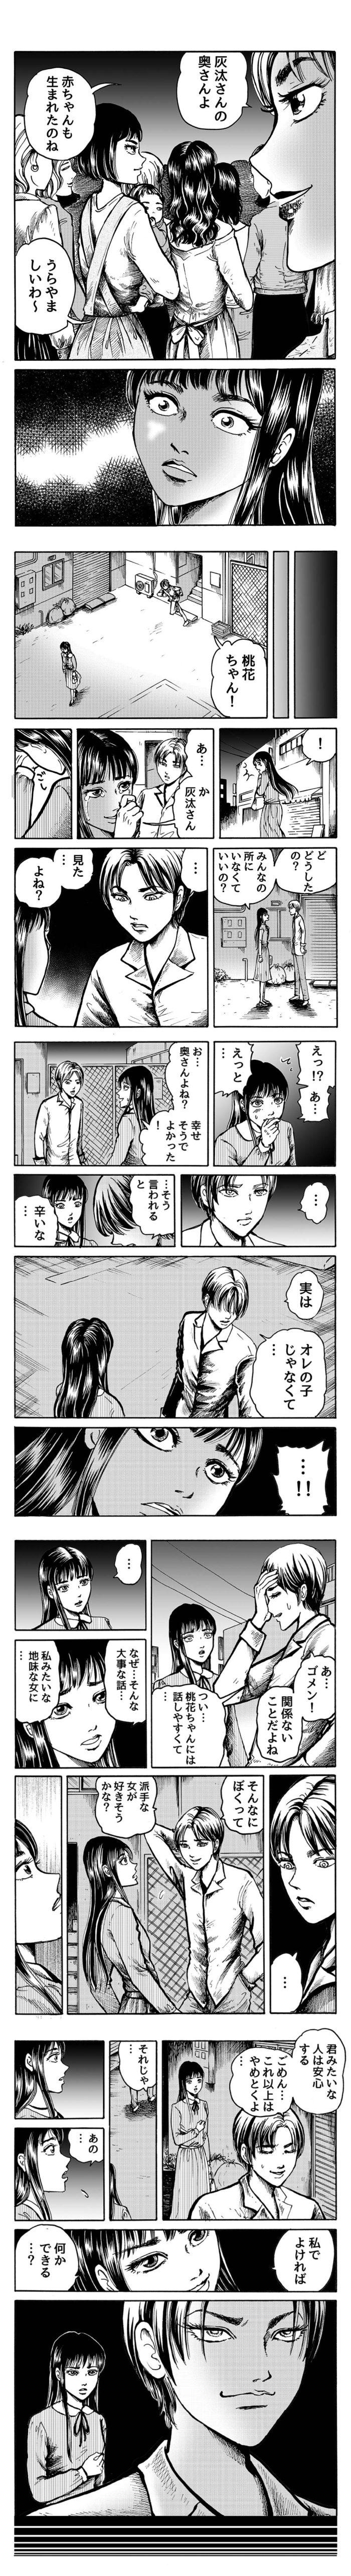 kyouaku-satsujin02-04